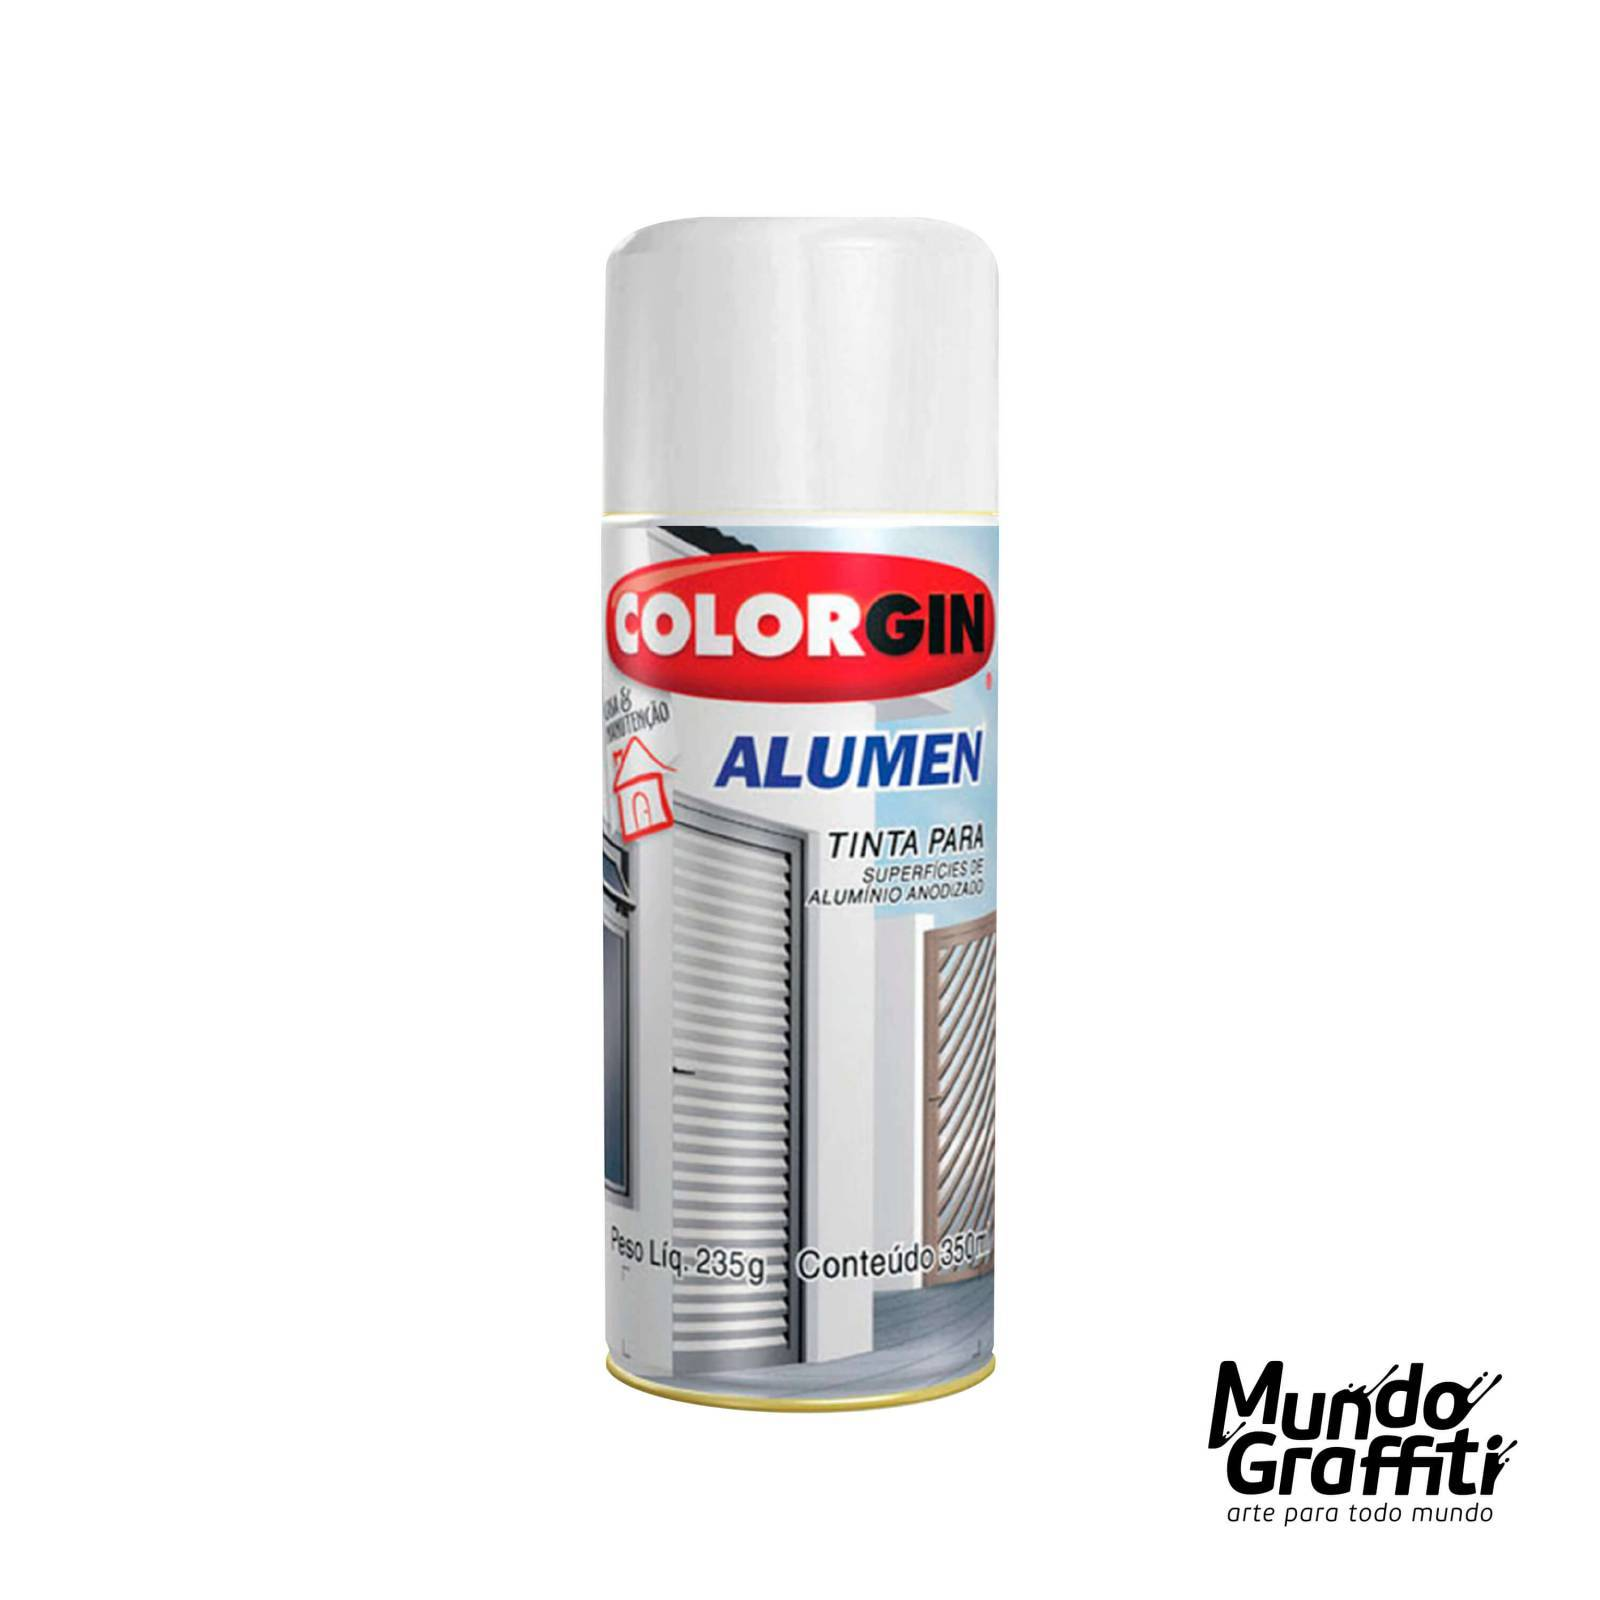 Tinta Spray Colorgin Alumen 7004 Branco 350ml - Mundo Graffiti